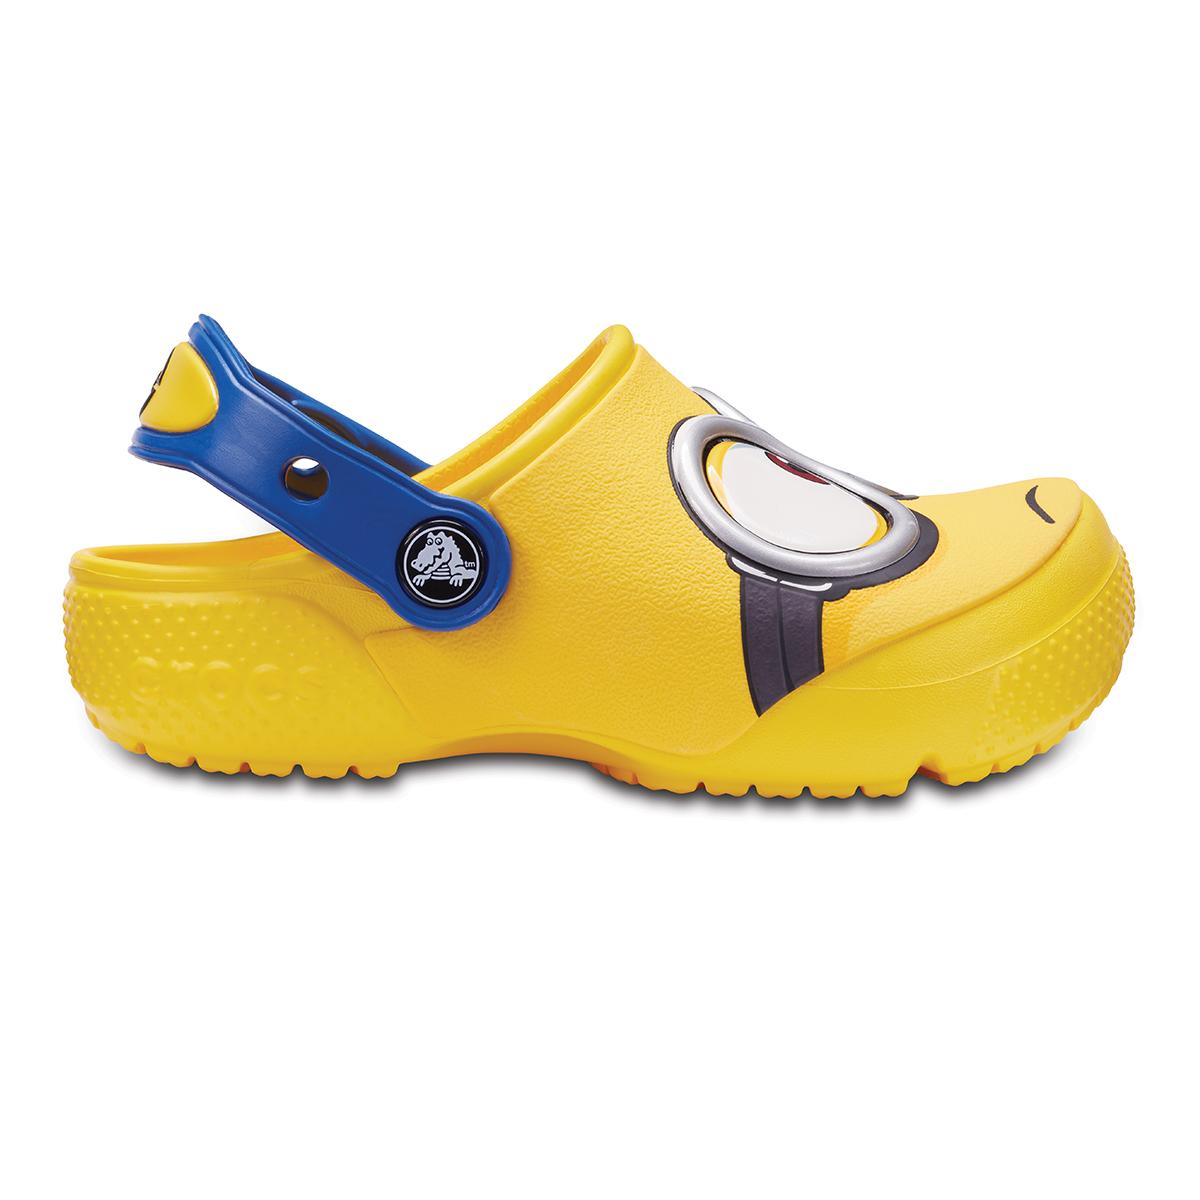 CrocsFunLab Minions Clog